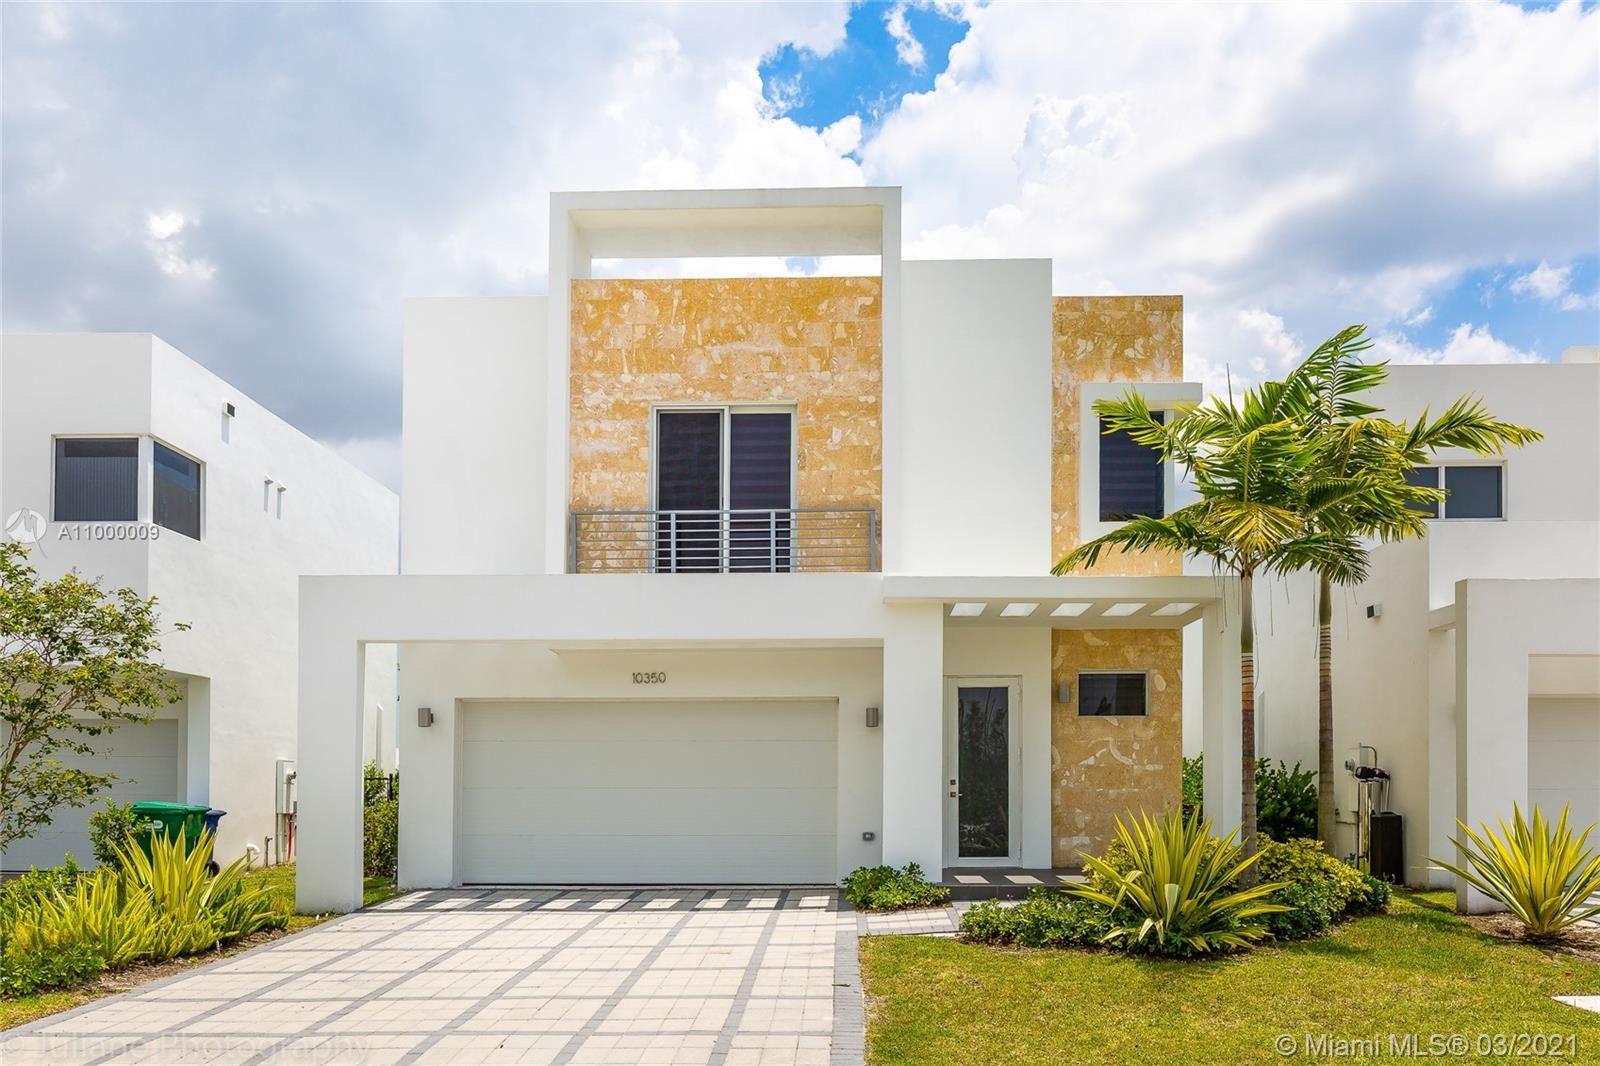 10350 NW 68 Terrace, Doral, FL 33178 - #: A11000009